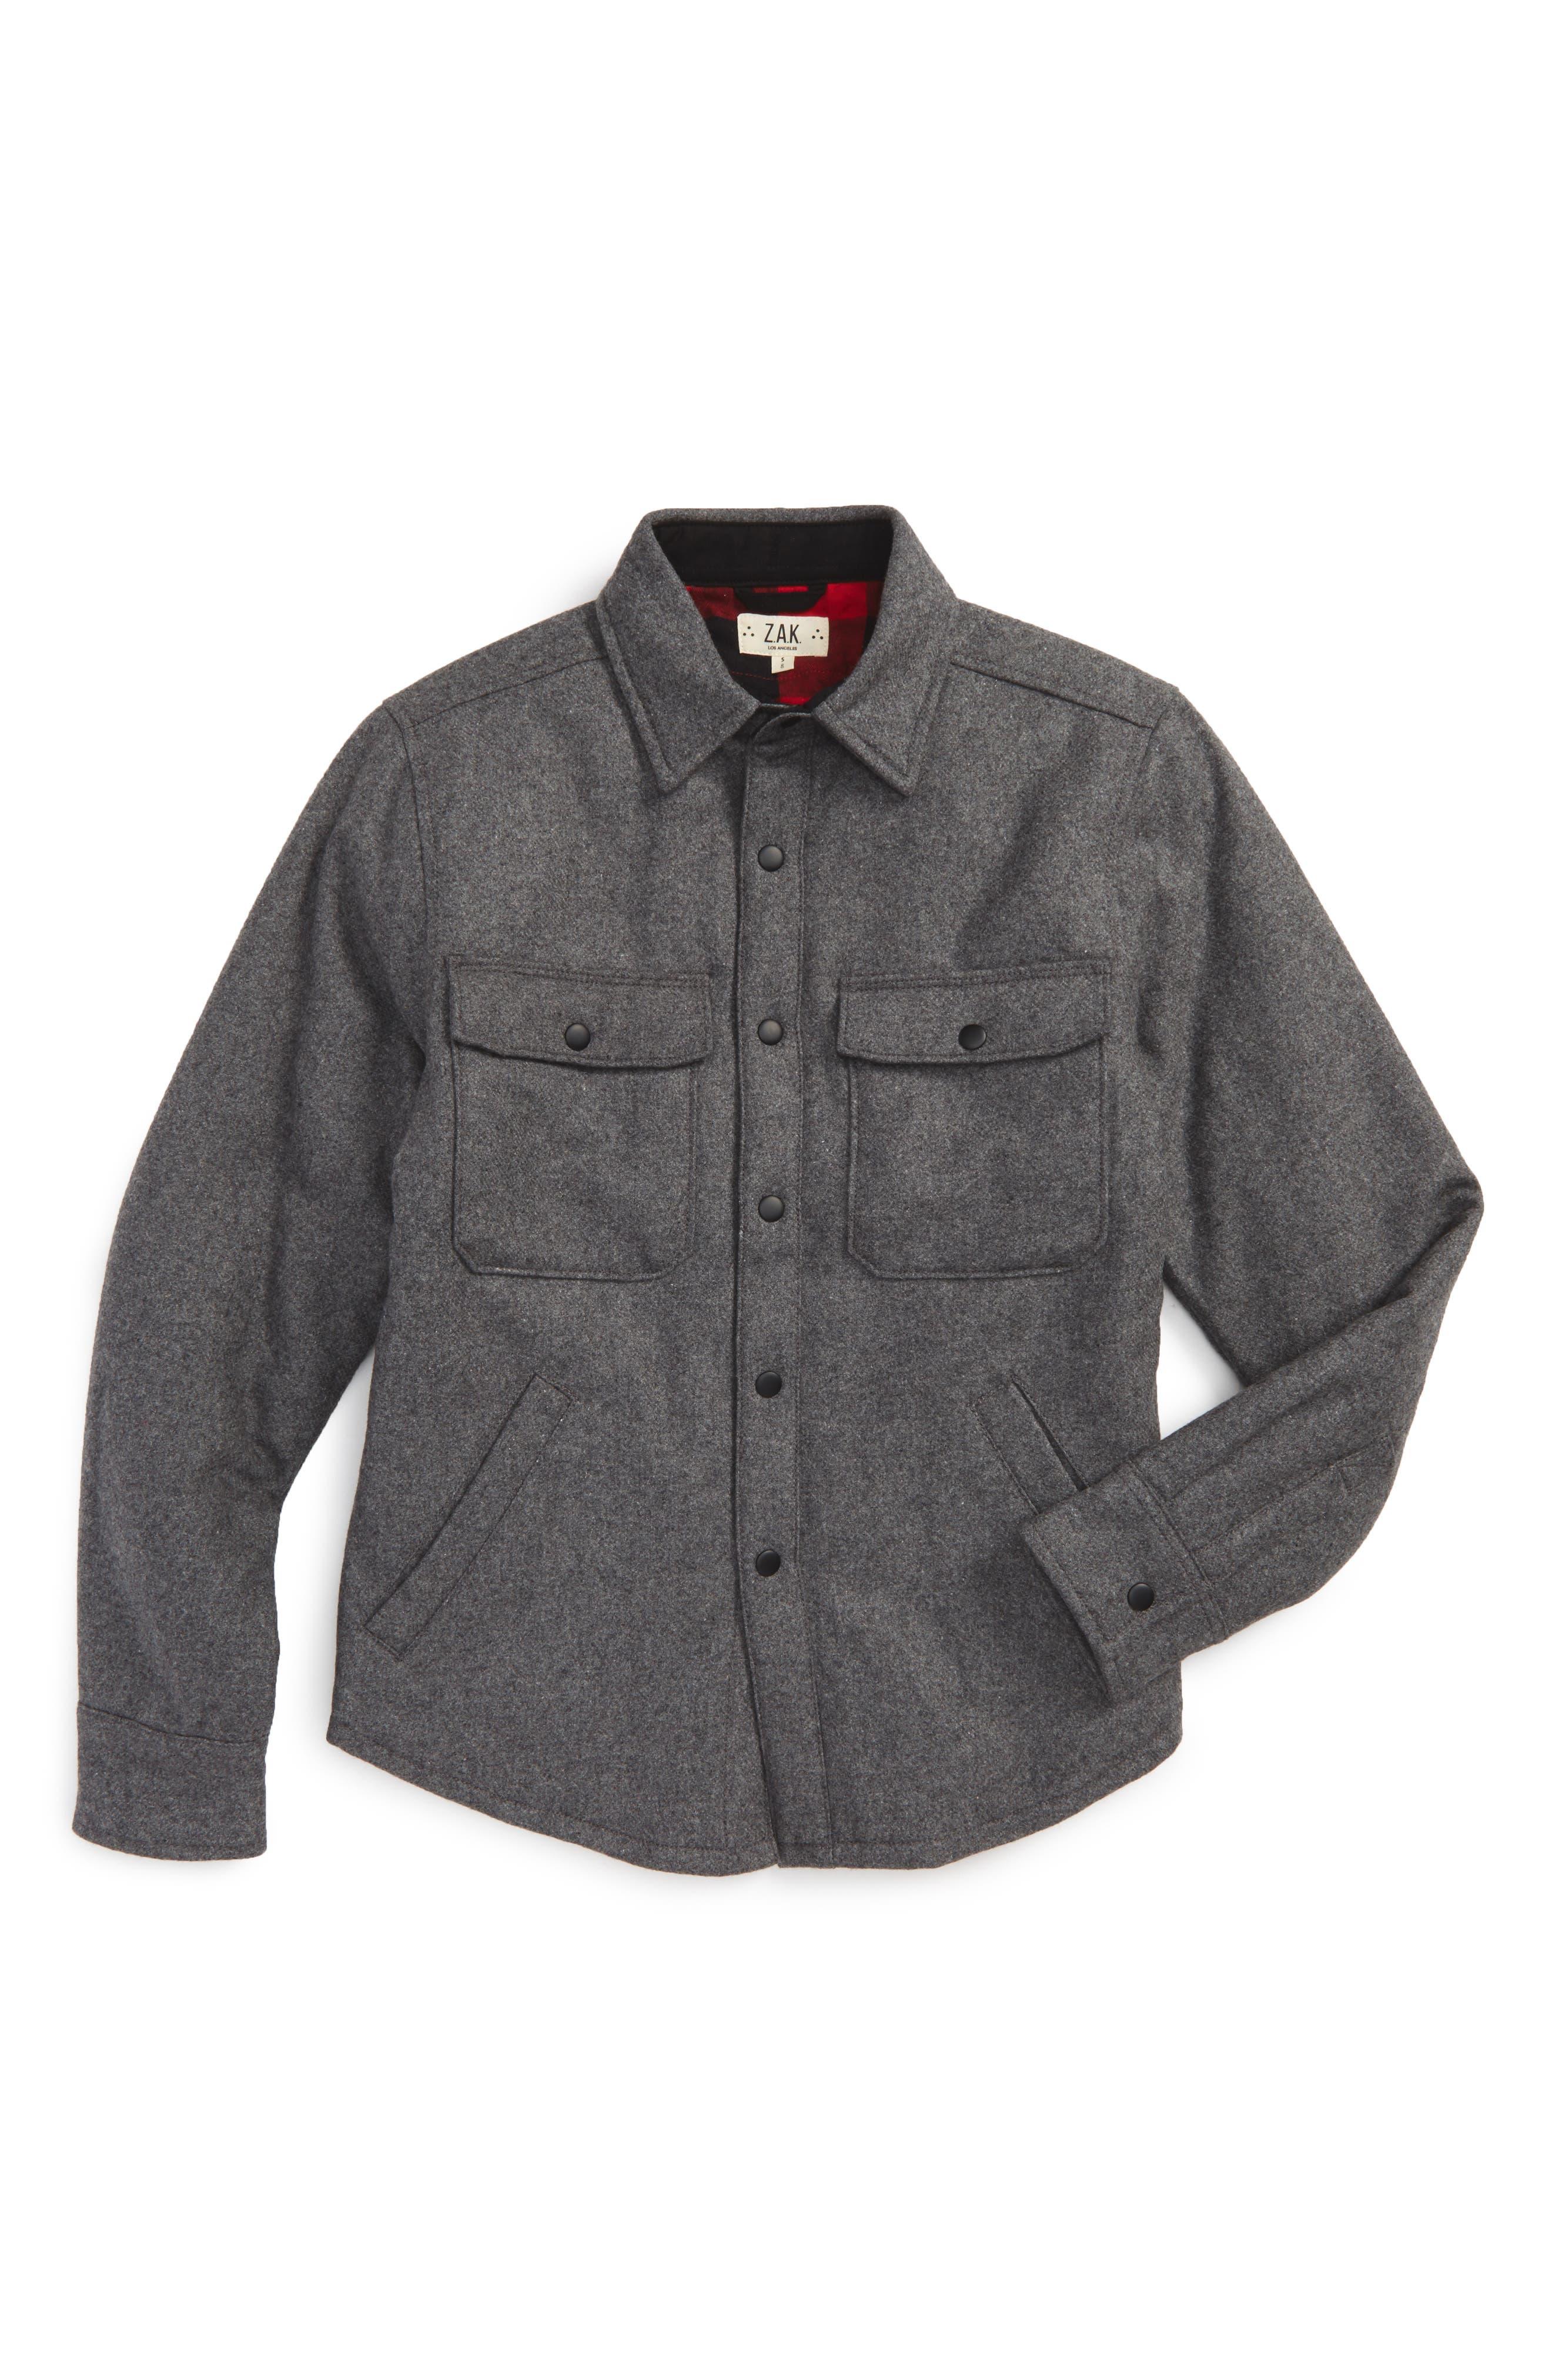 Main Image - Z.A.K. Brand Flannel Shirt Jacket (Little Boys)